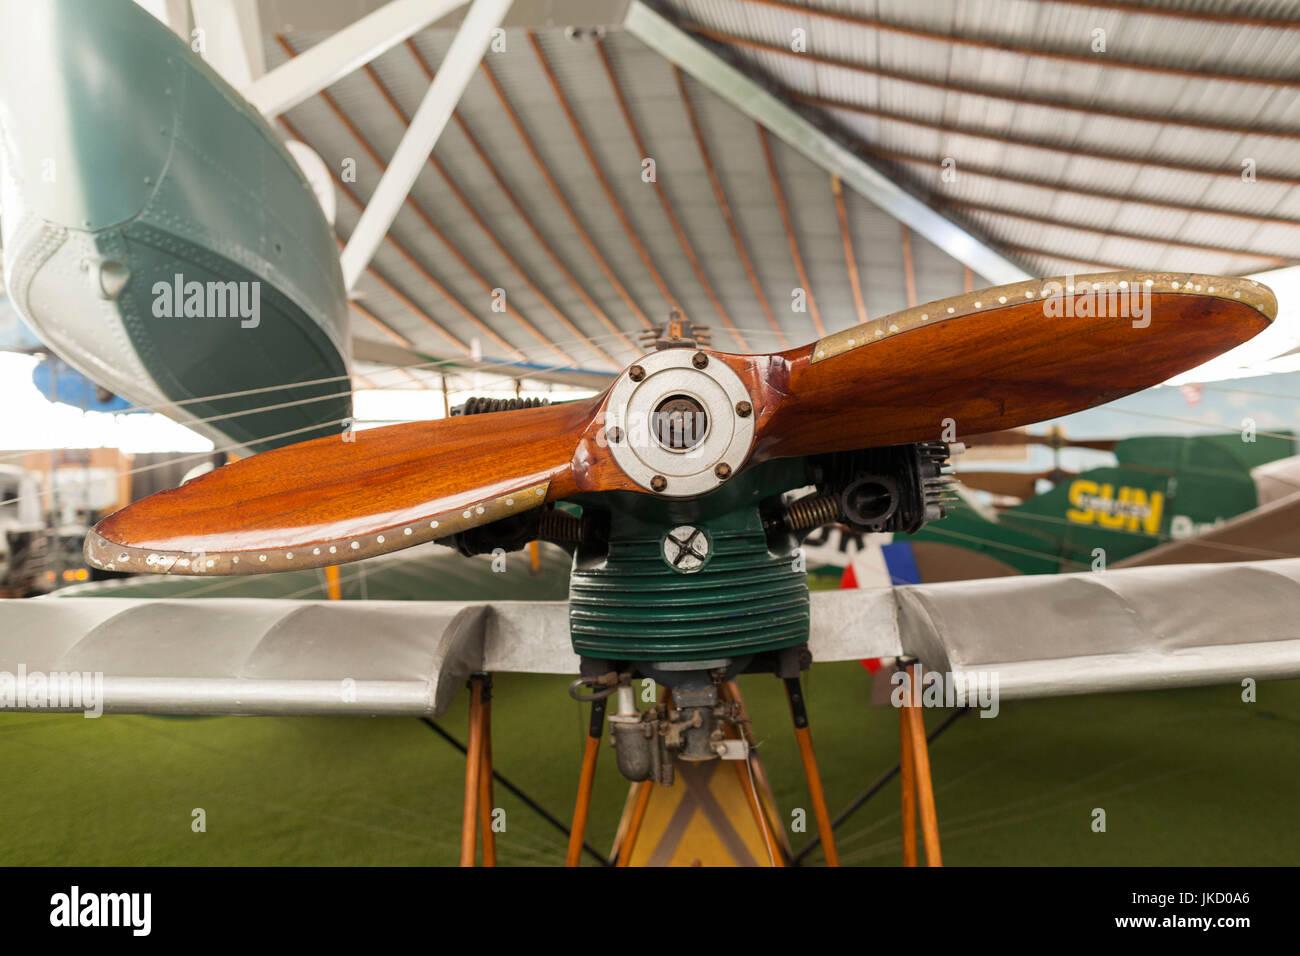 Australia, Western Australia, Bull Creek, RAAF Aviation Heritage Museum, wooden propeller - Stock Image